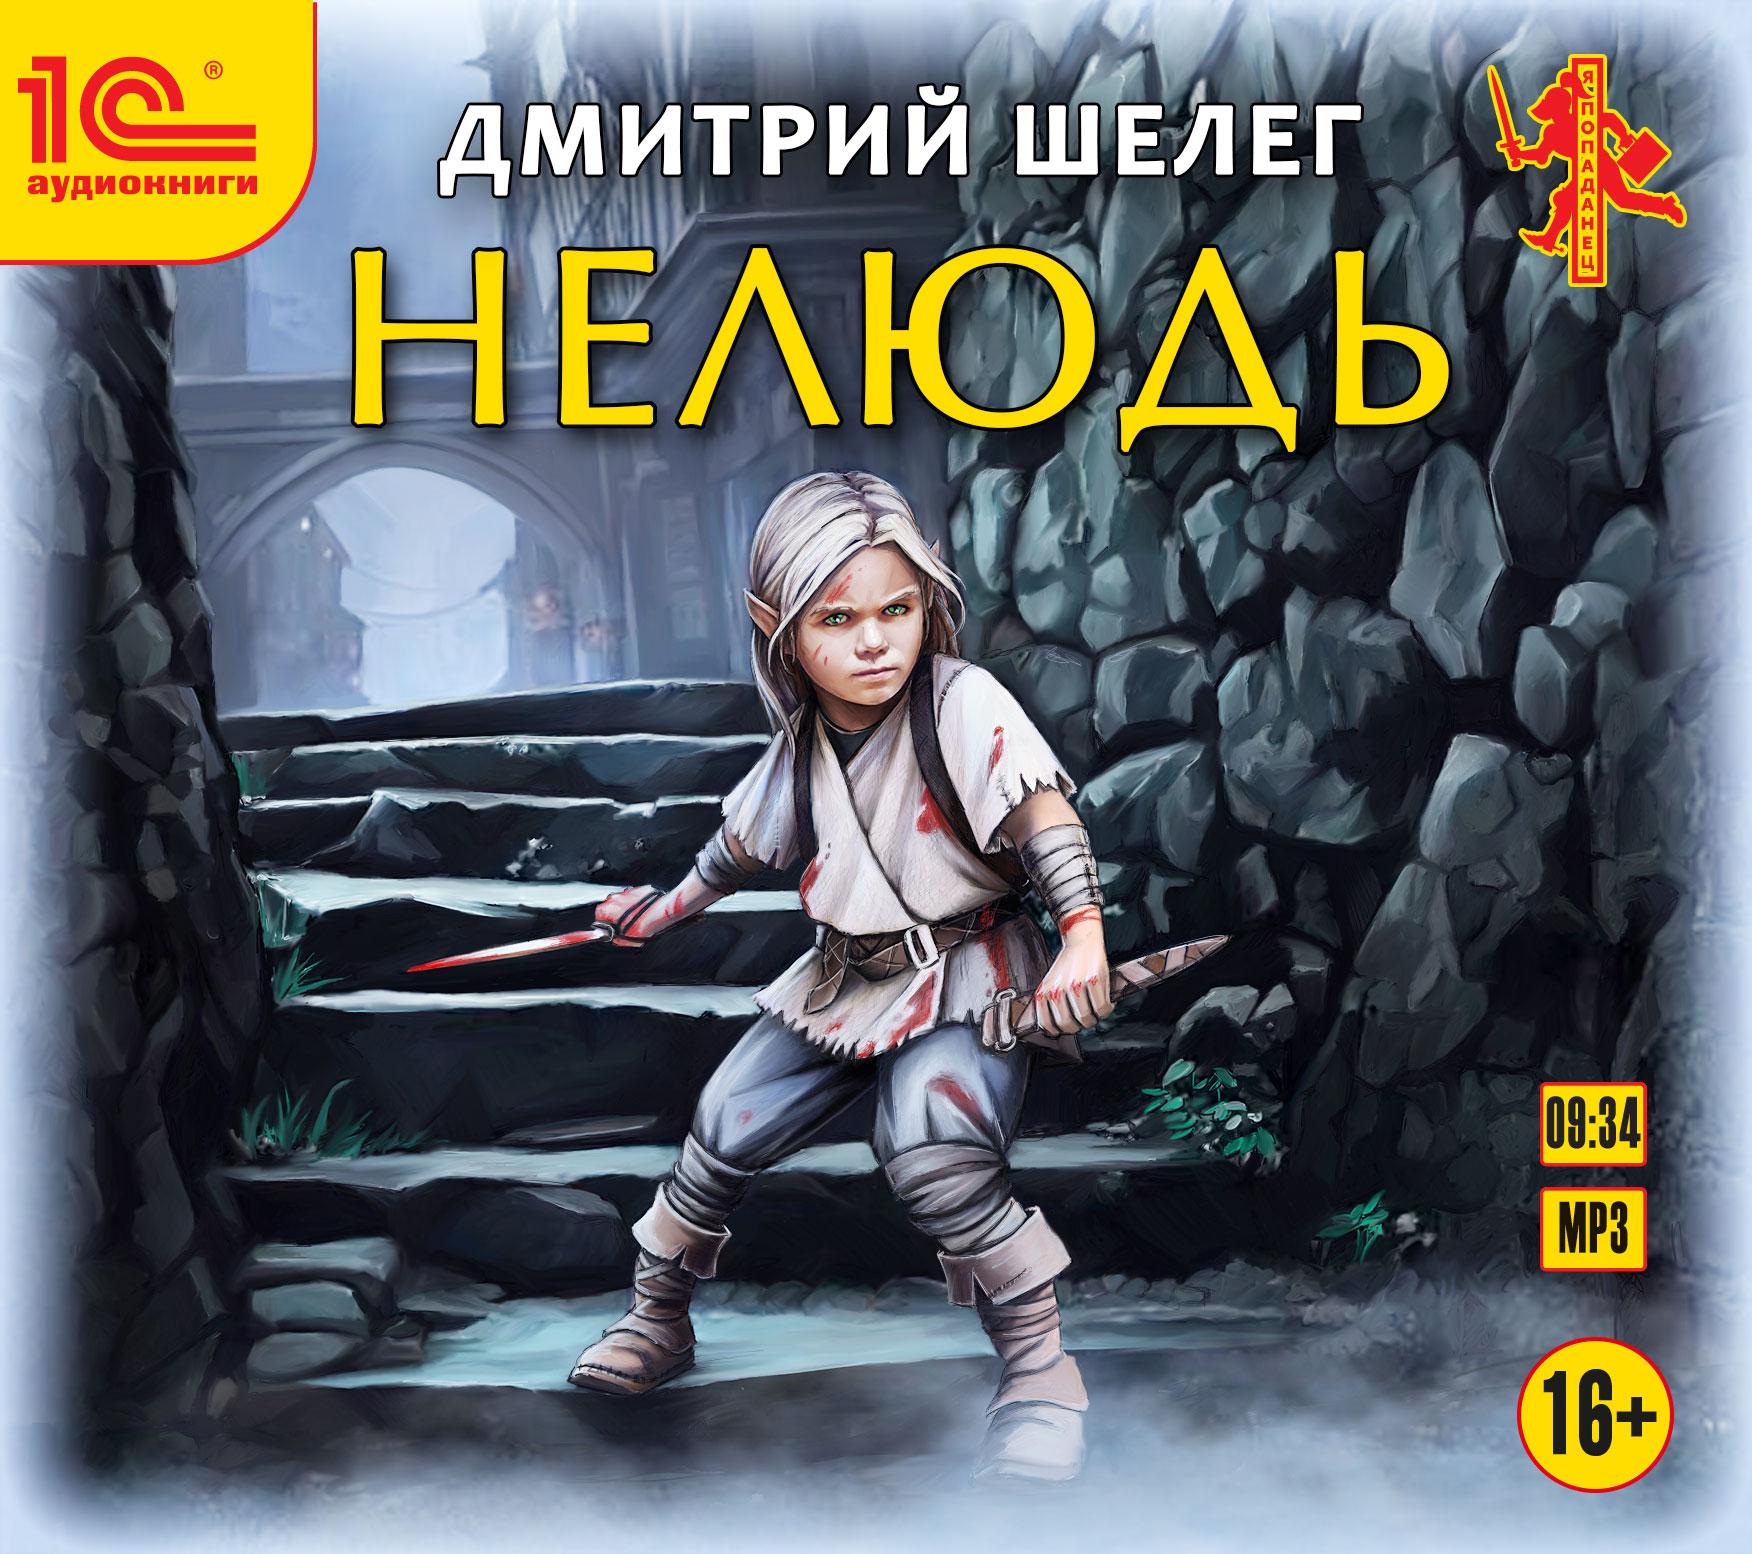 Дмитрий Шелег Нелюдь дмитрий шелег нелюдь великая степь